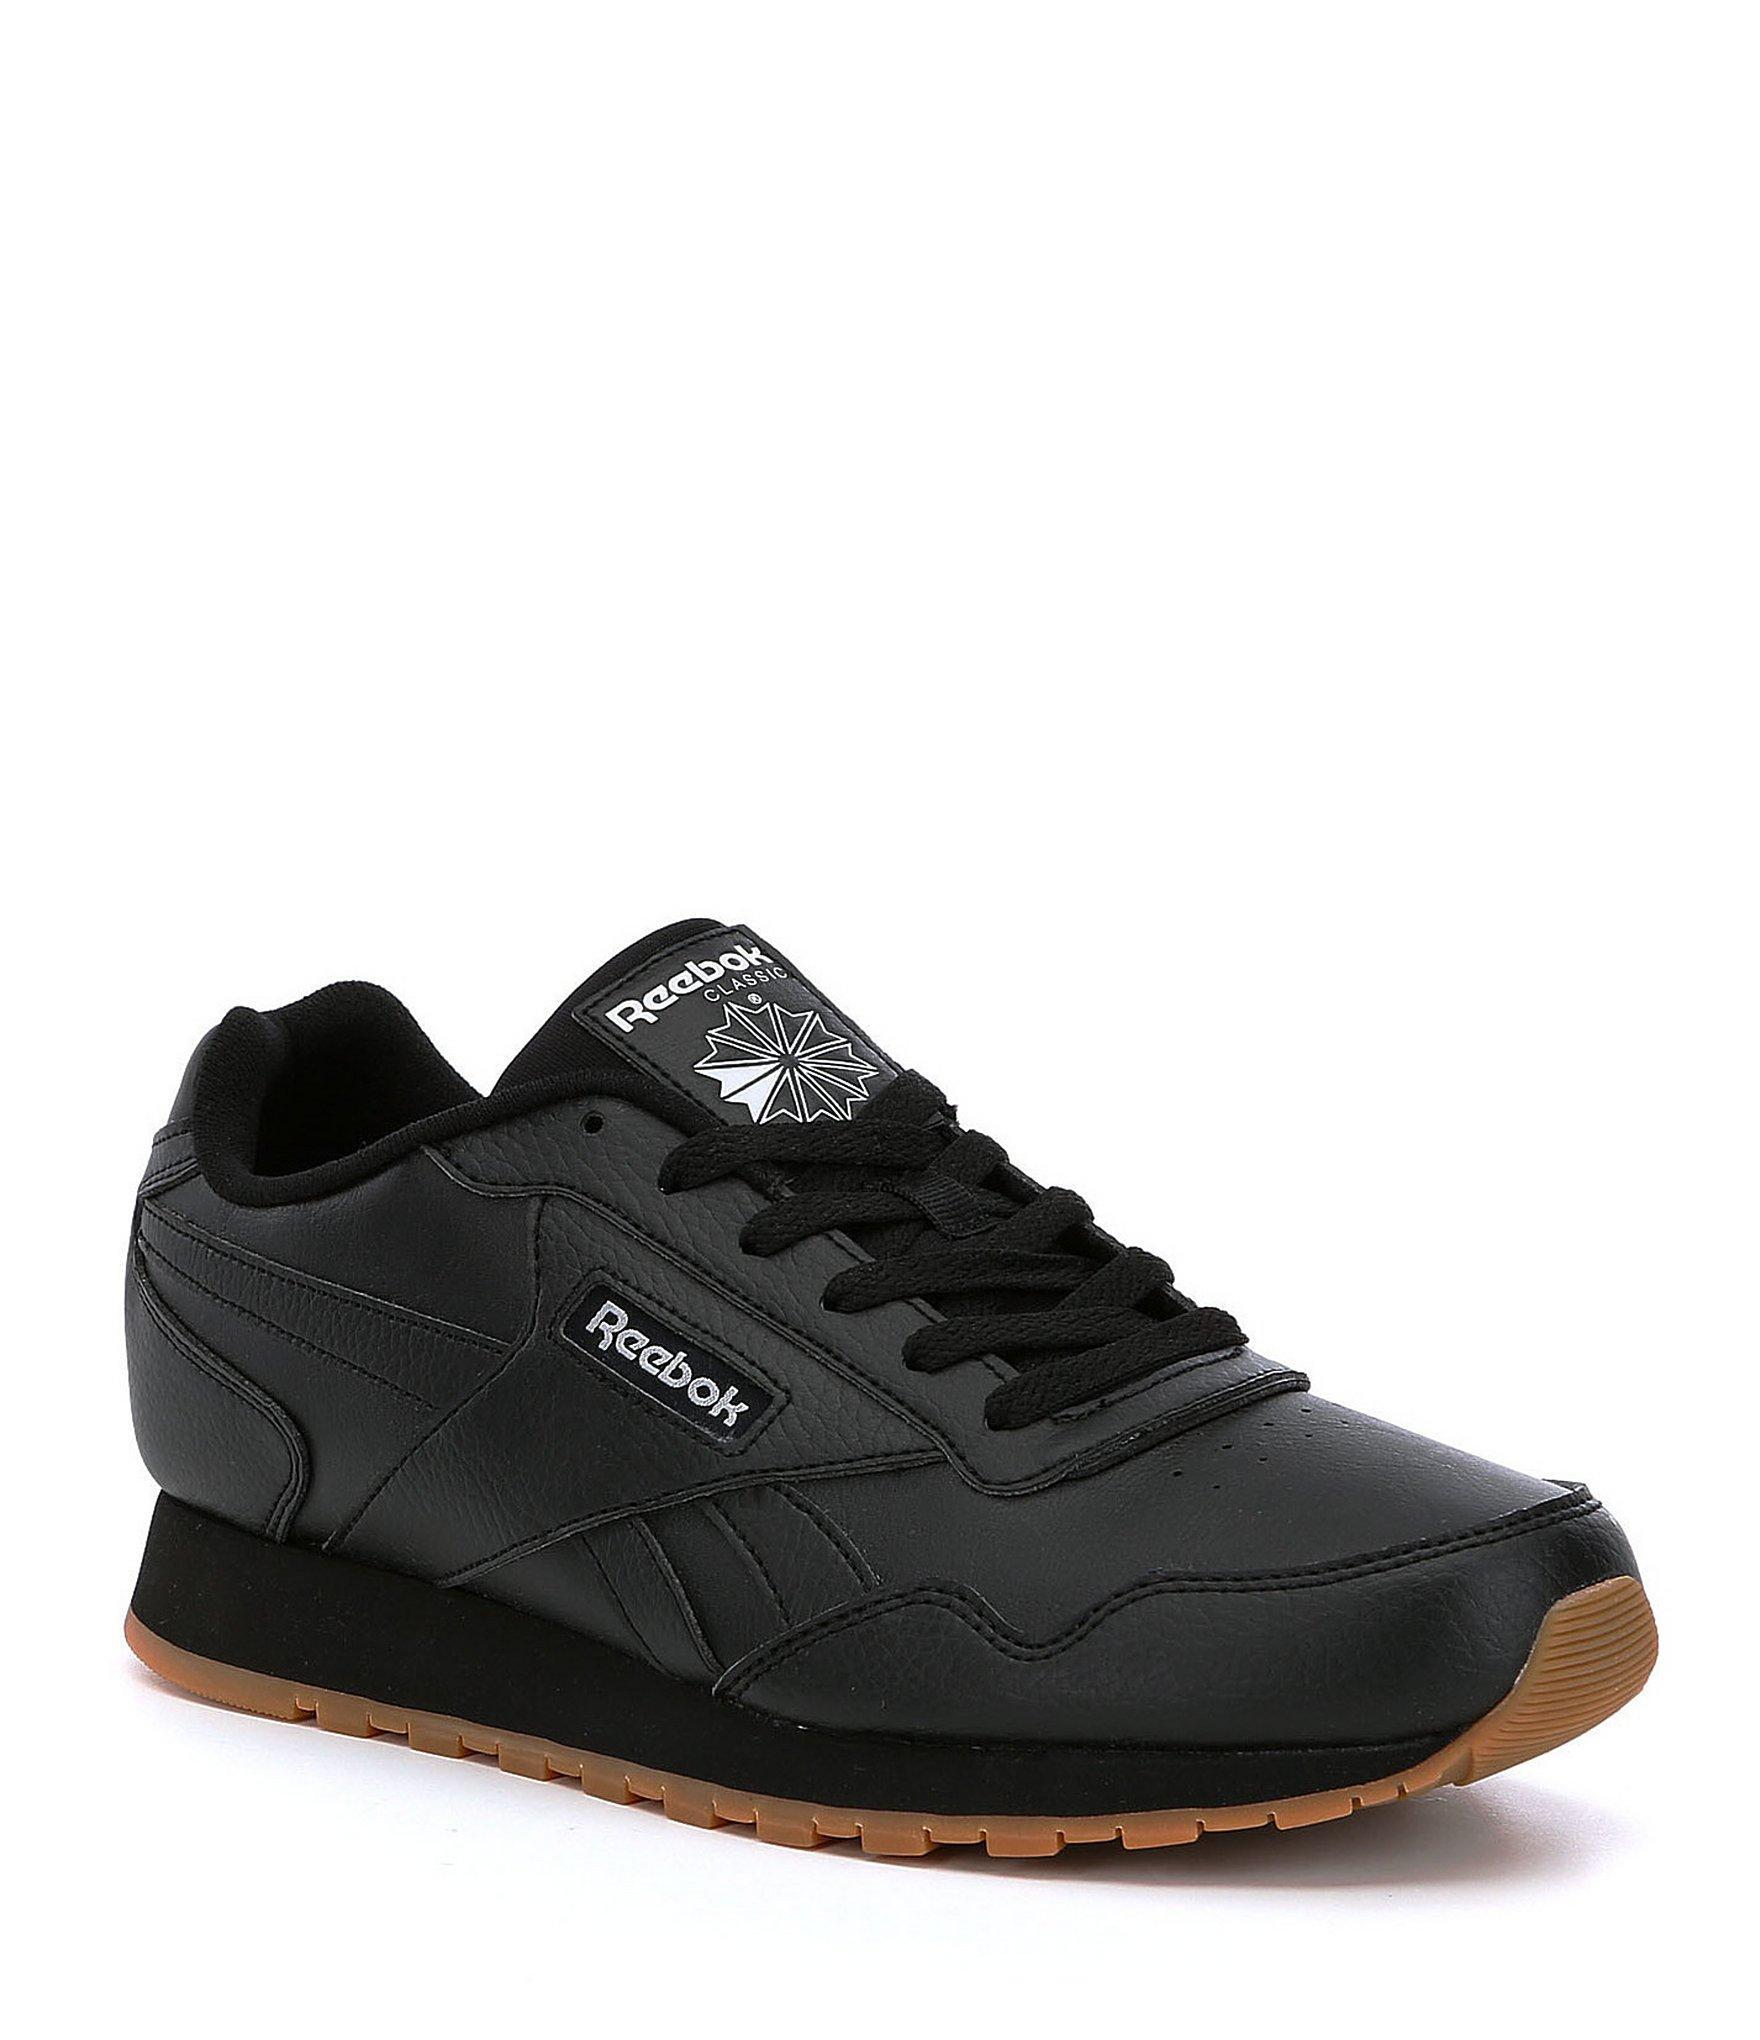 674d36e5dab5a Lyst - Reebok Men s Classic Harman Run Shoes in Black for Men